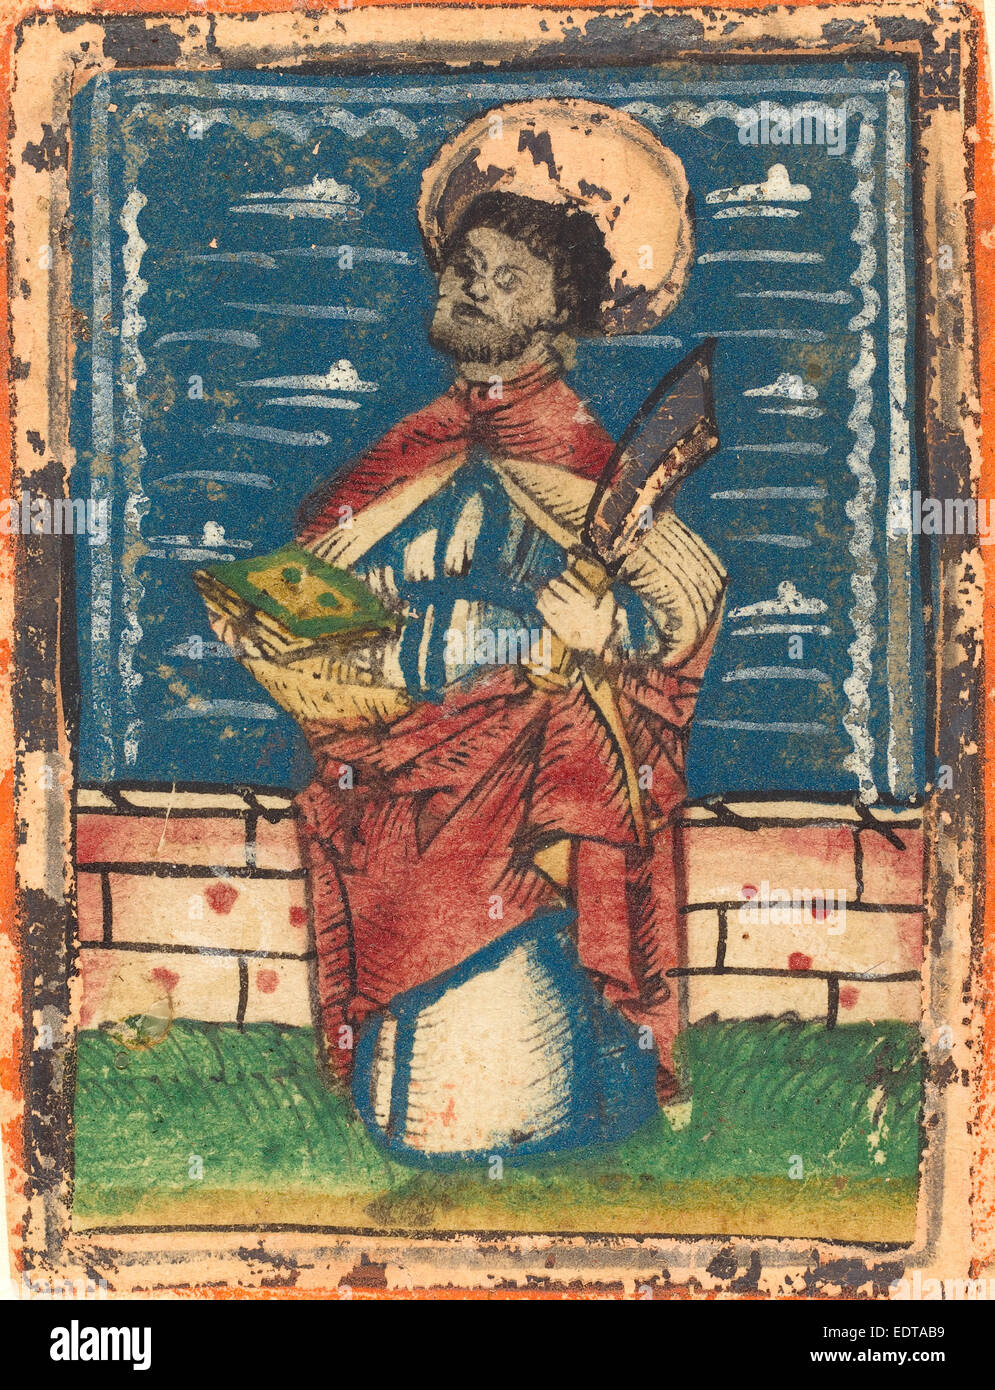 German 15th Century, Saint Bartholomew, 1480-1490, woodcut, hand-colored in blue, red lake, green, yellow, white, - Stock Image